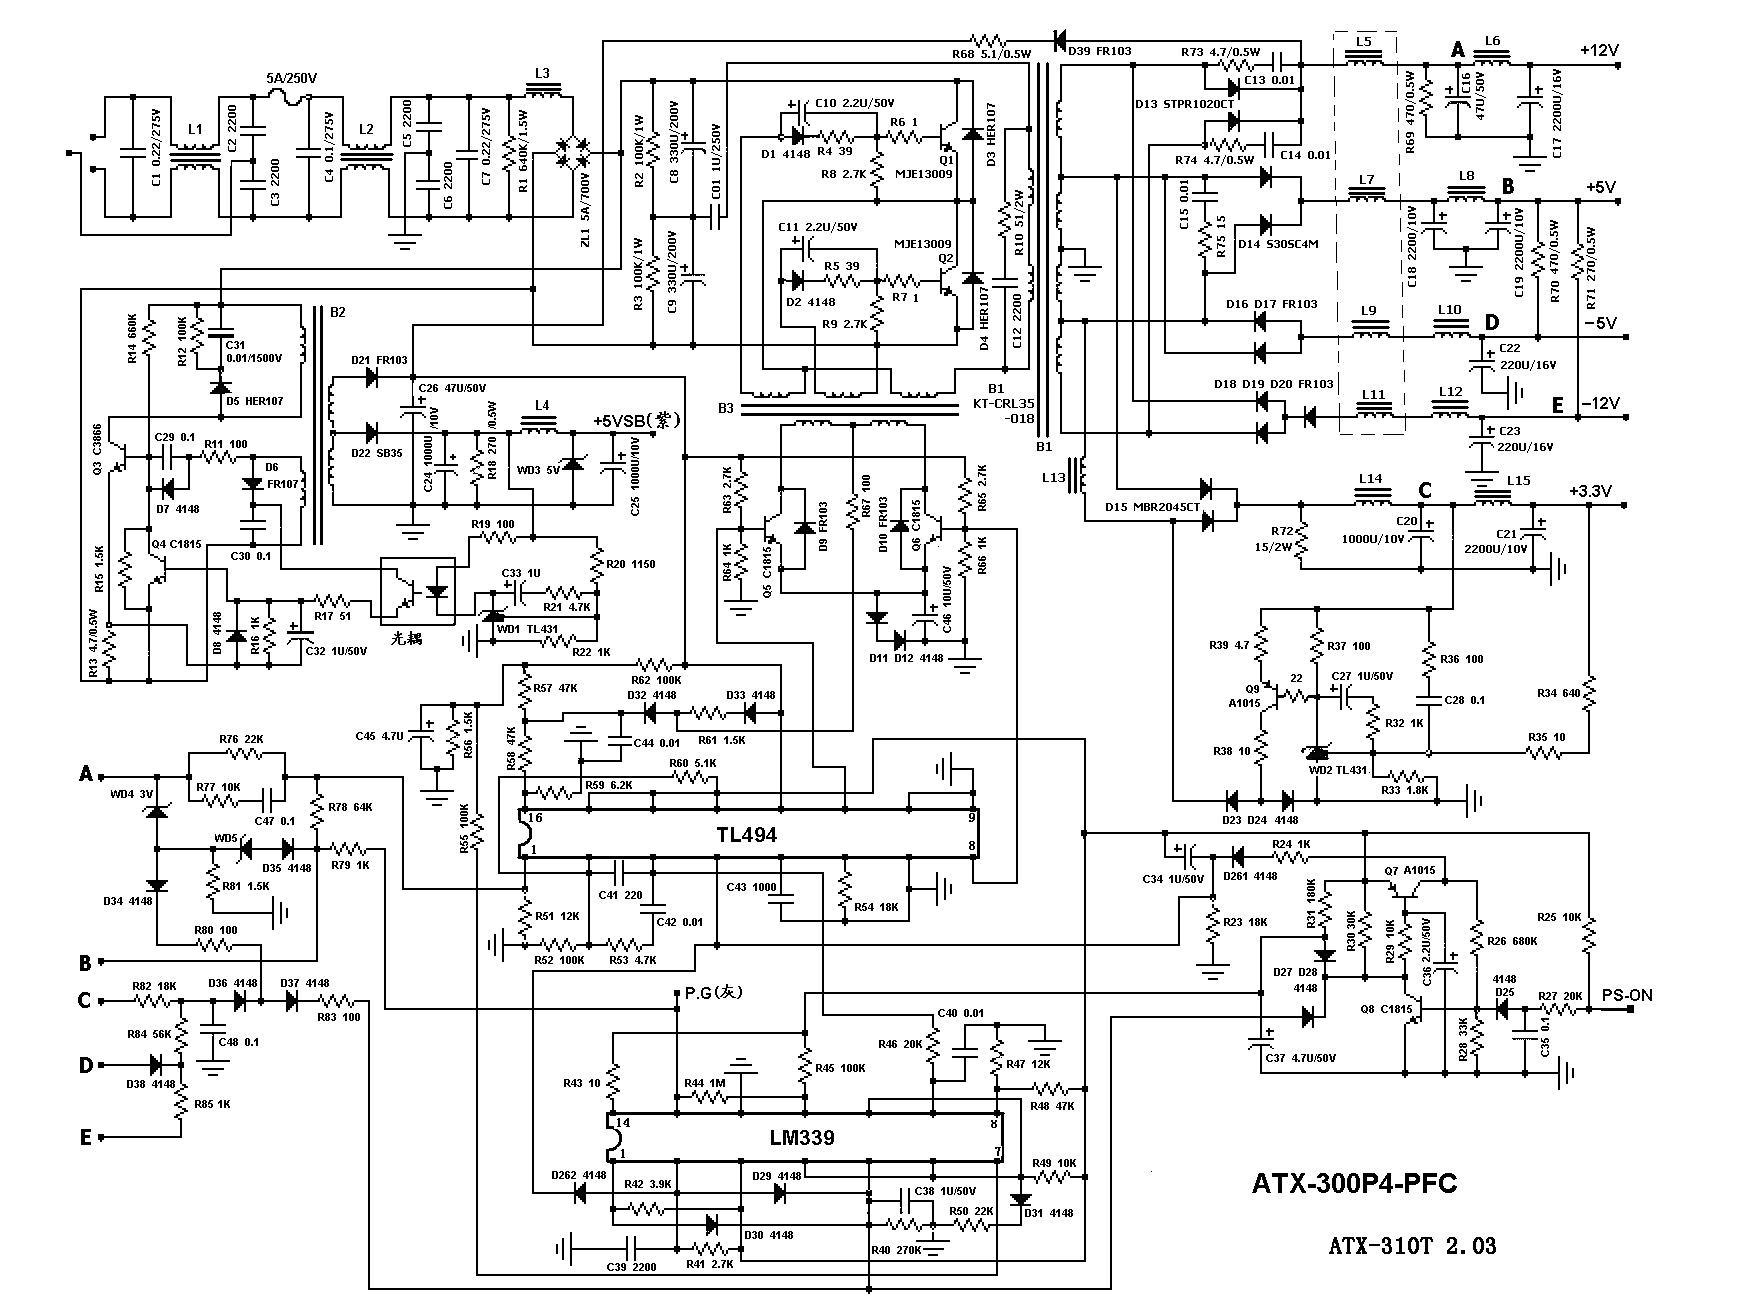 Pc Wiring Diagram | Schematic Diagram - Computer Power Supply Wiring Diagram